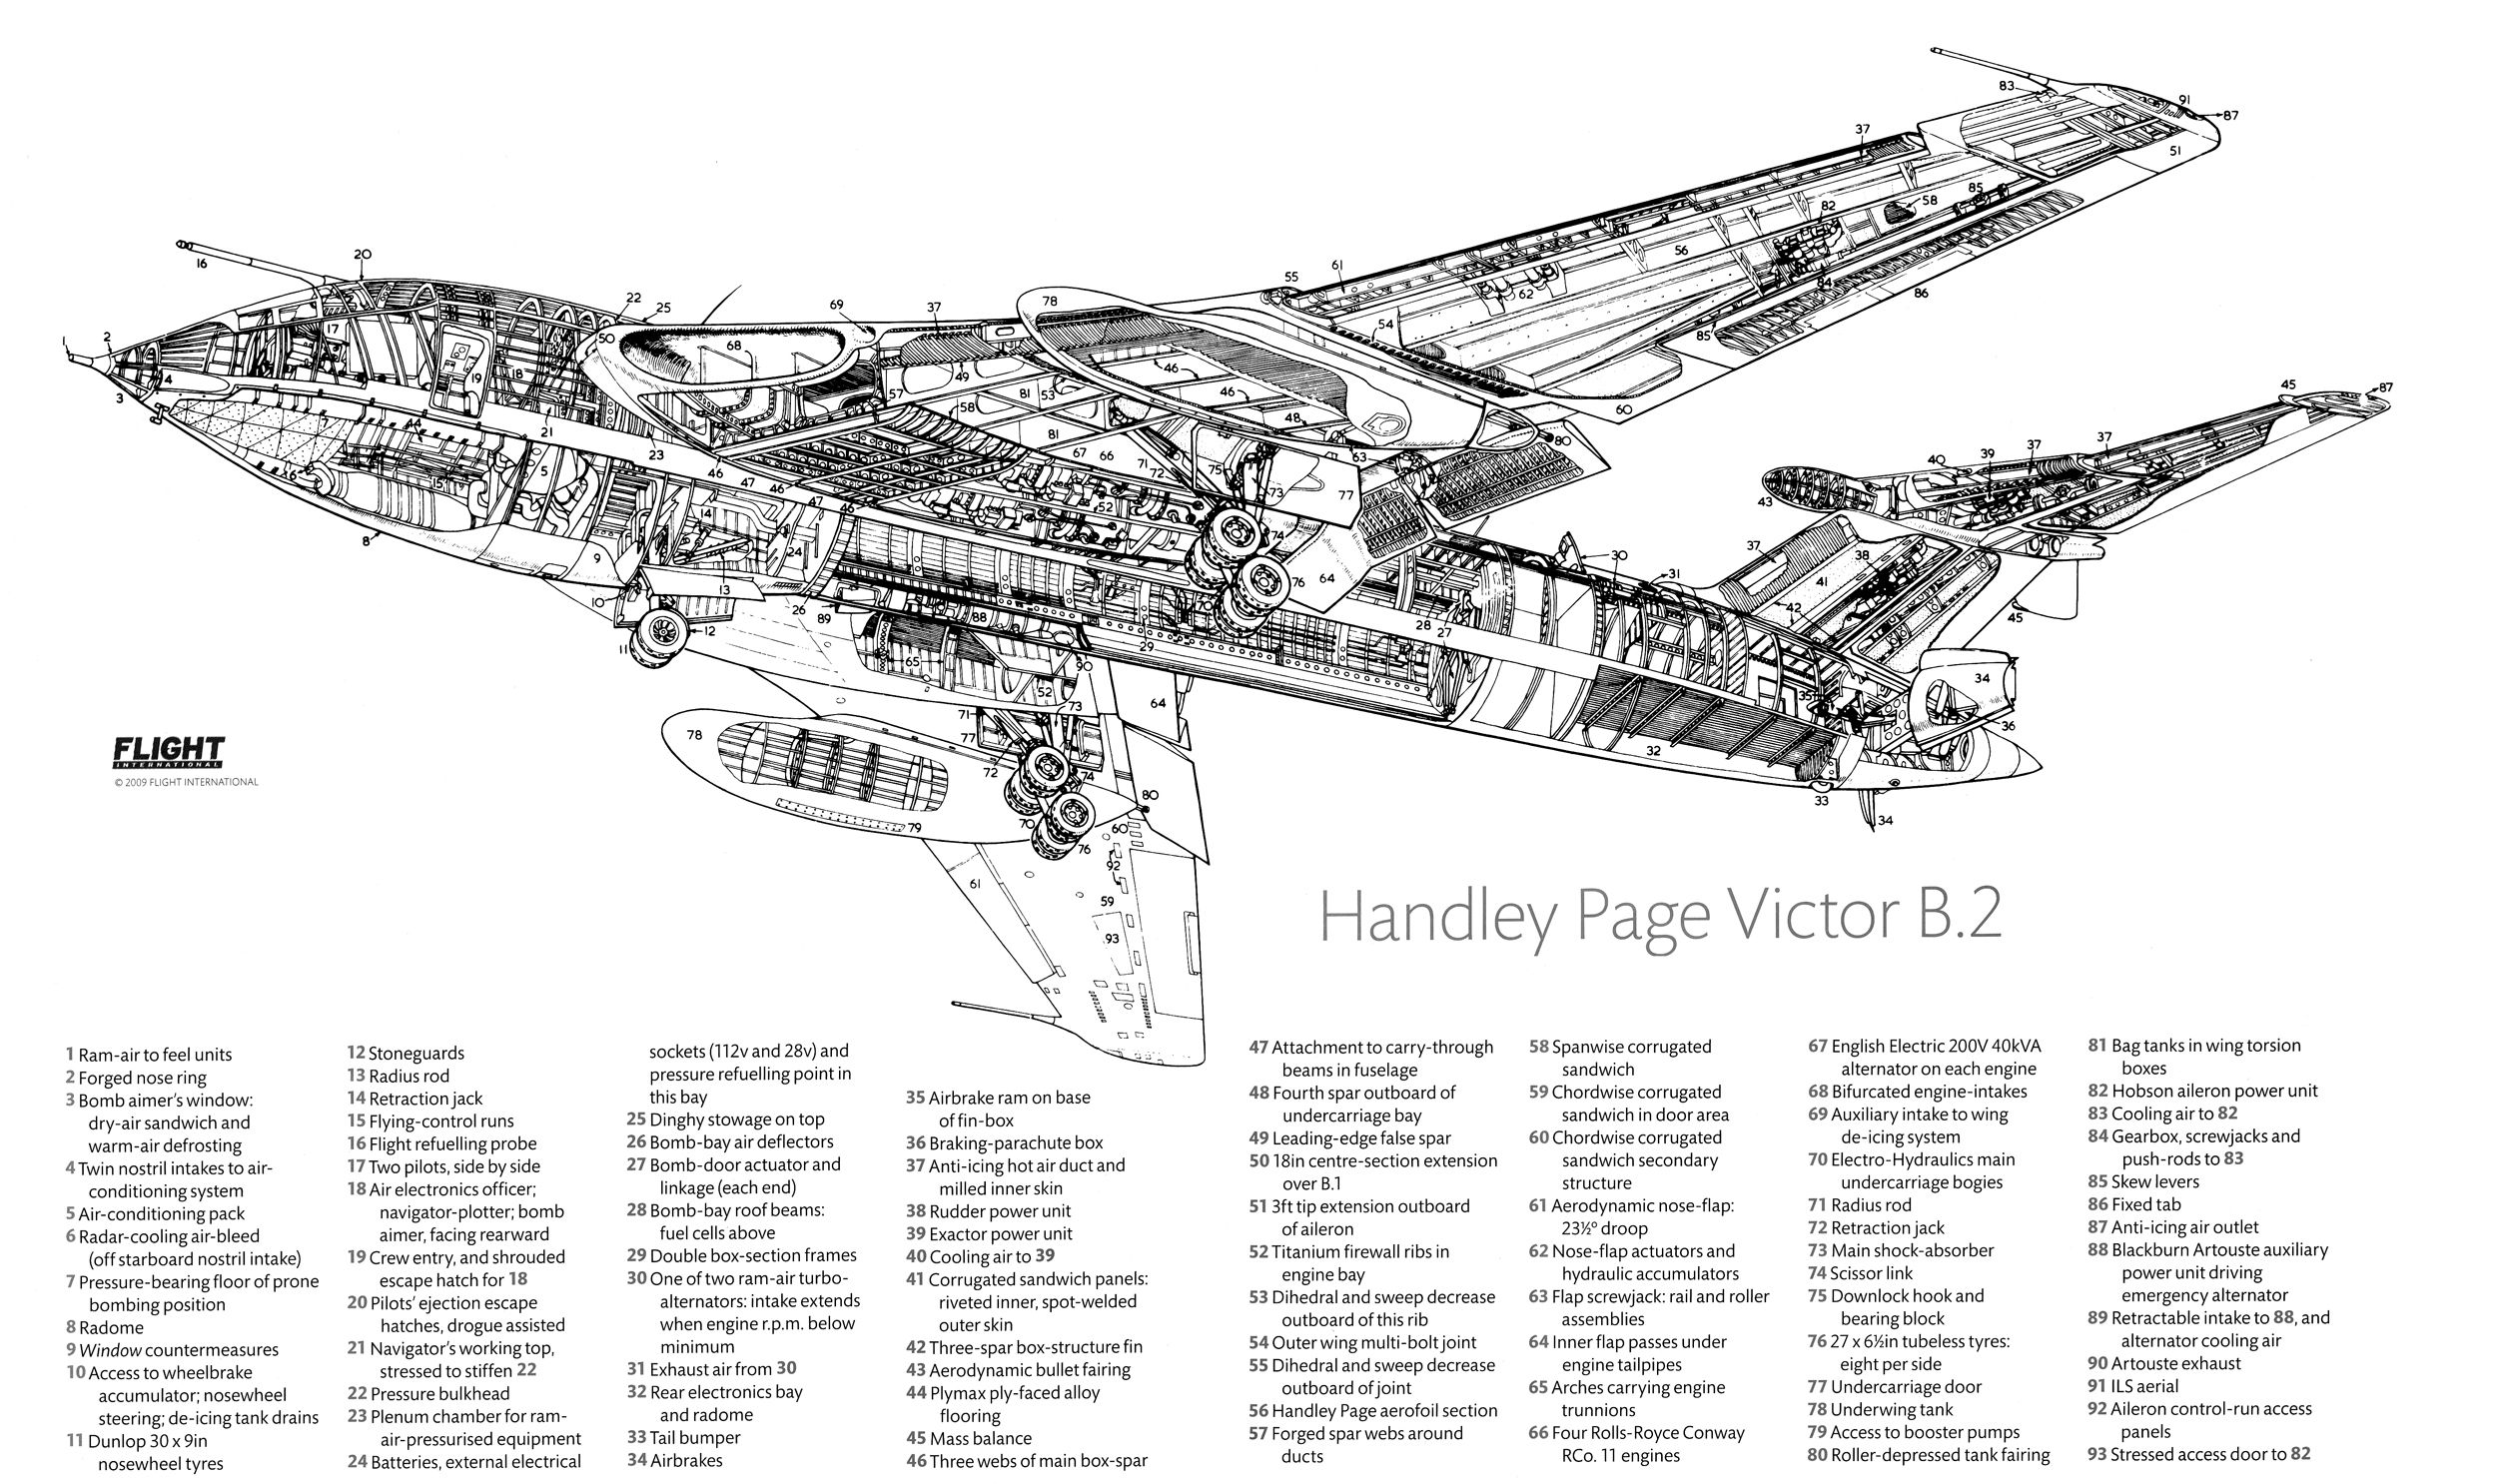 Handley Page Victor Cutaways